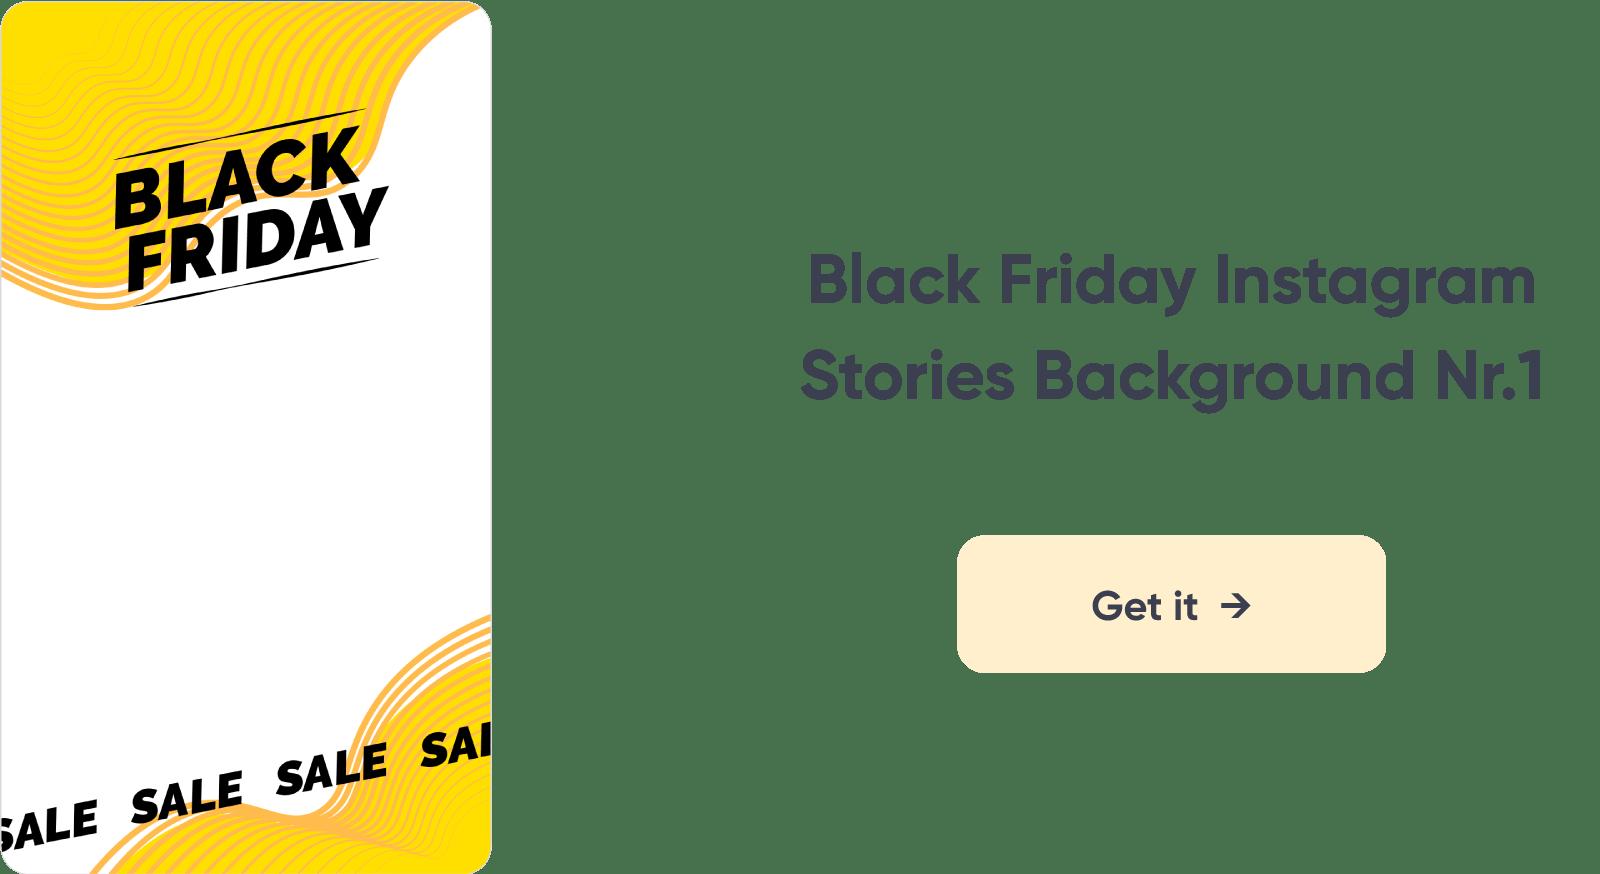 Black Friday Instagram Stories Background 1